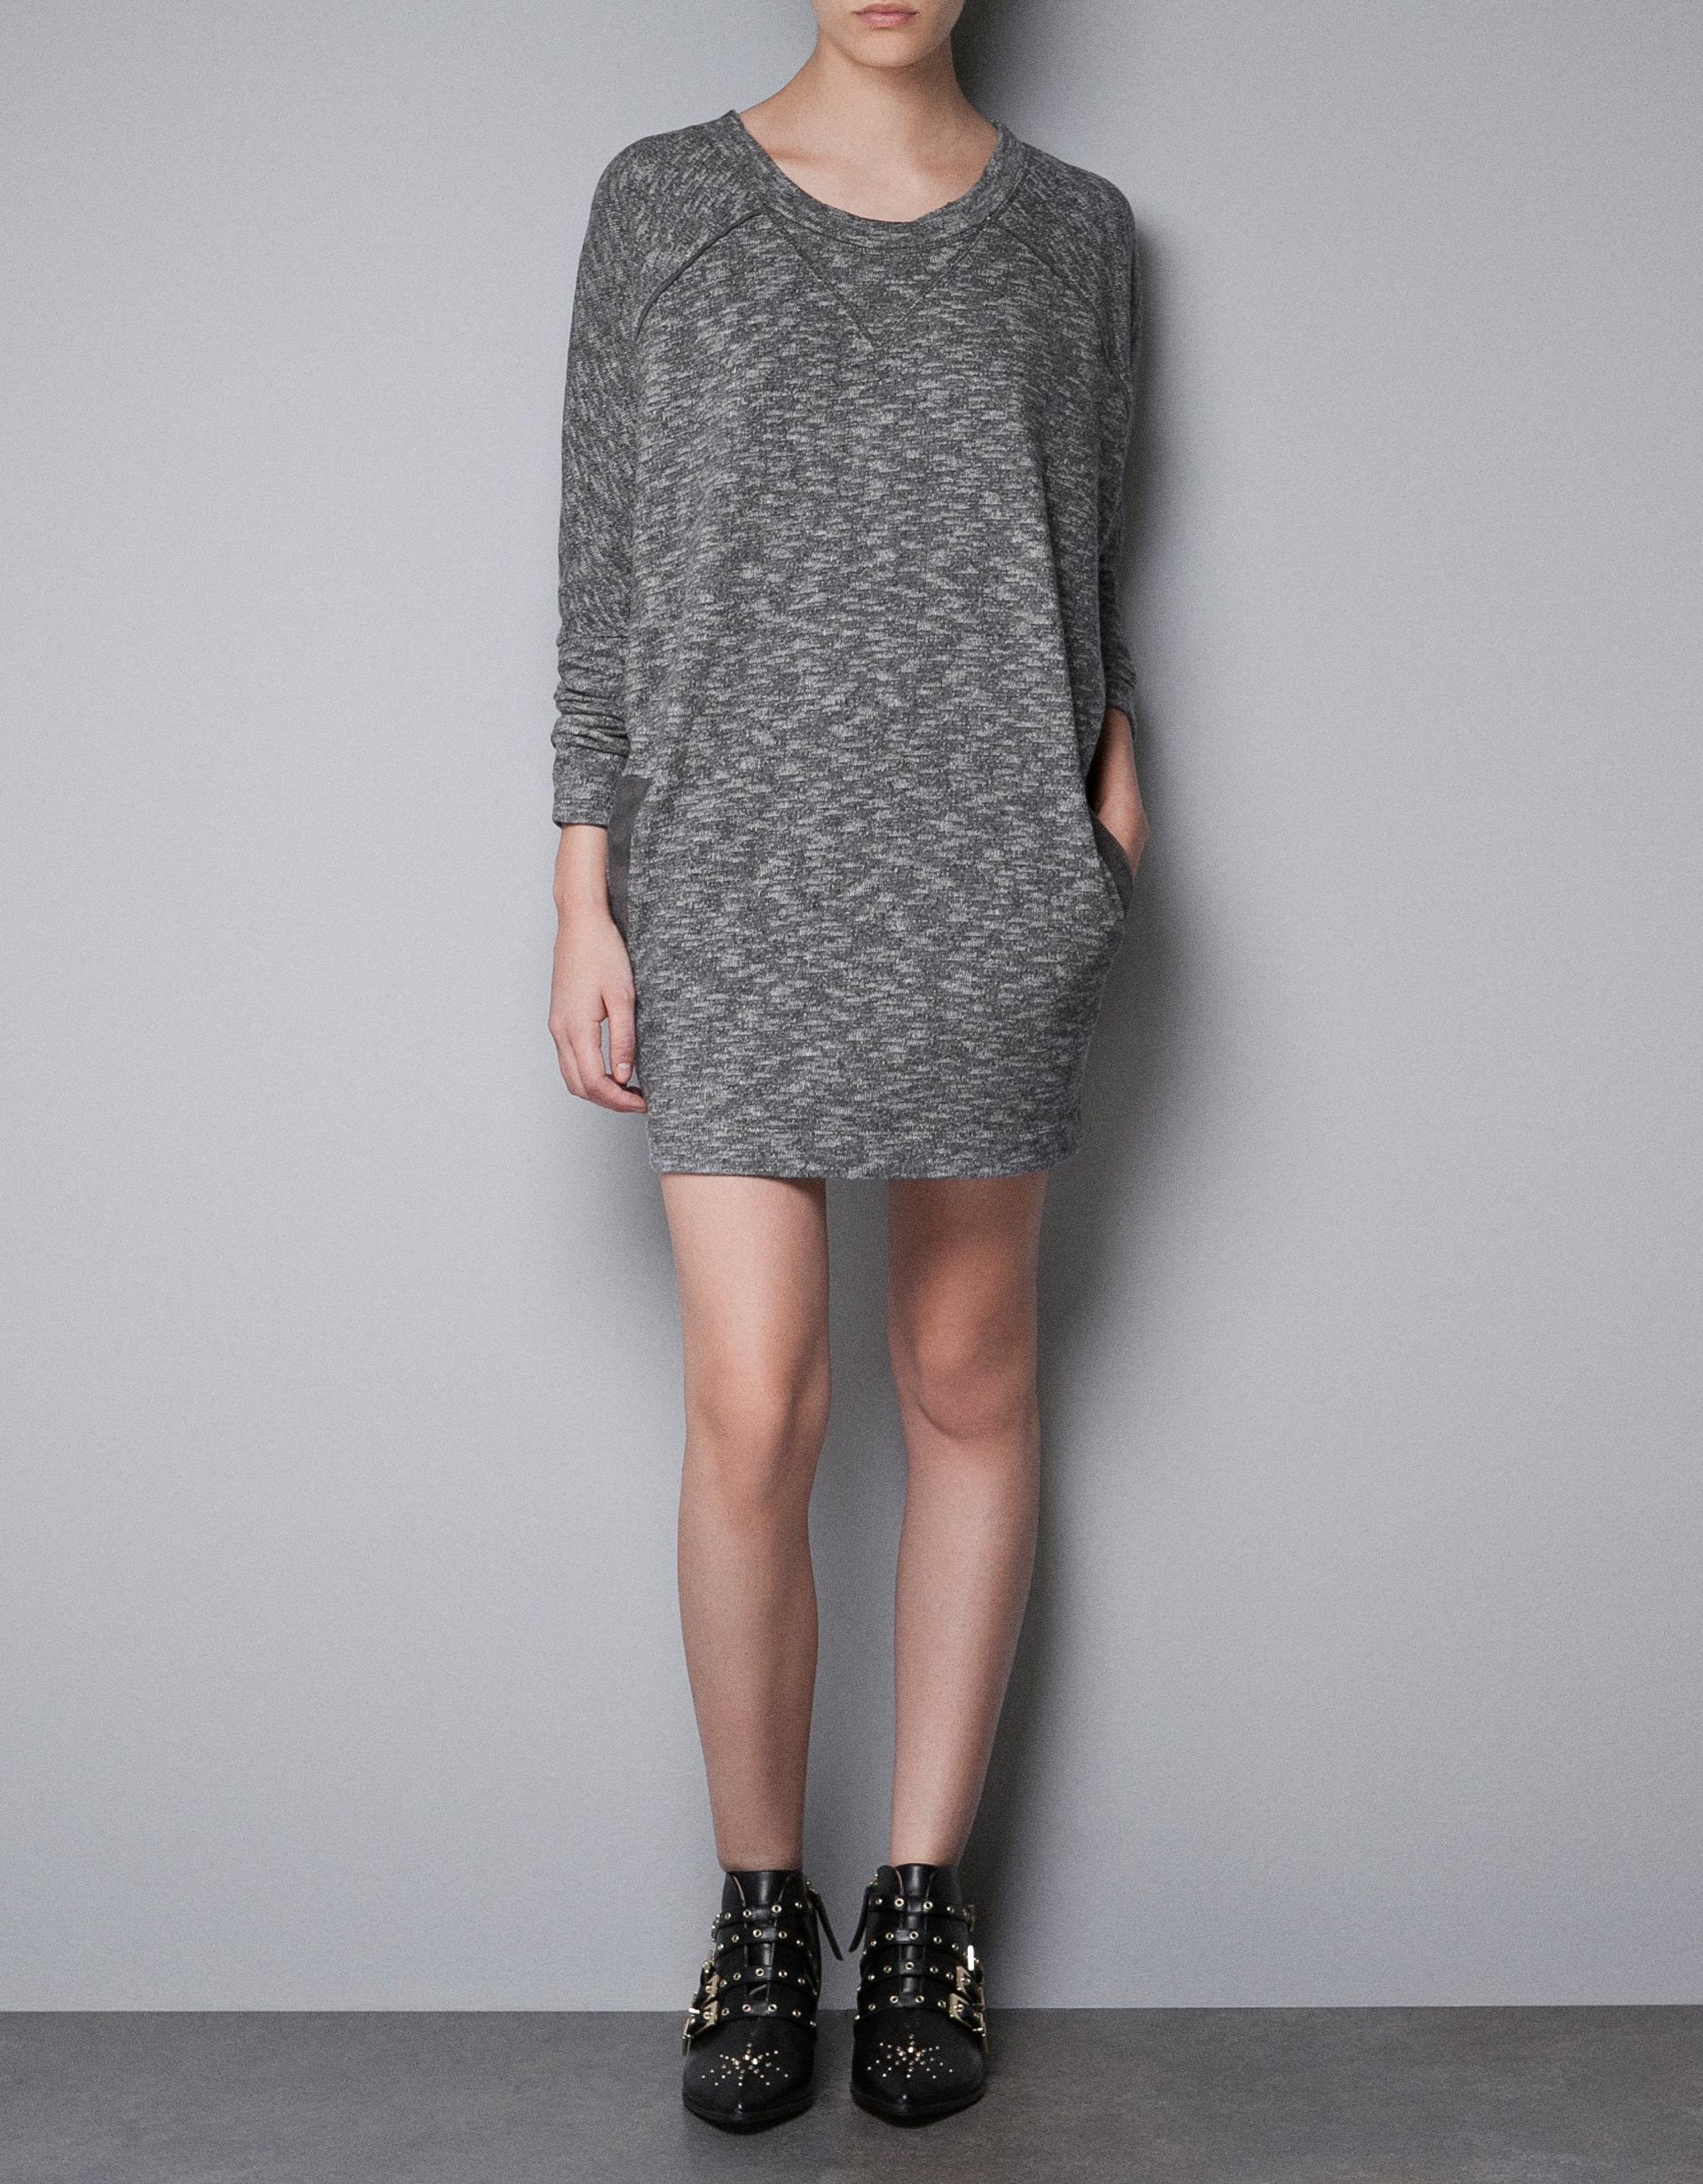 Zara tshirt dress in gray lyst for Zara black t shirt dress